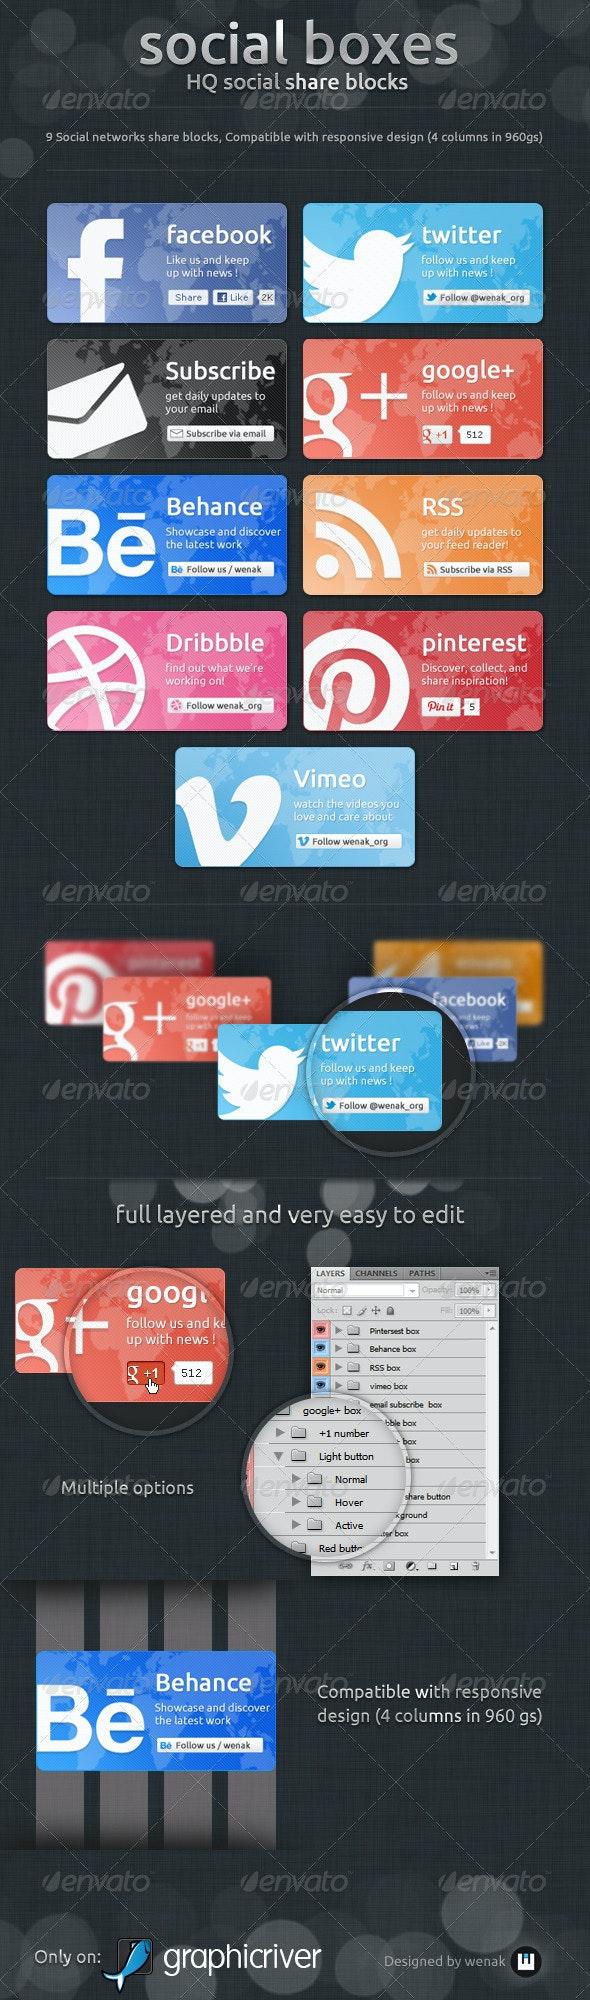 Social Boxes - Social Share Blocks   - Social Media Web Elements